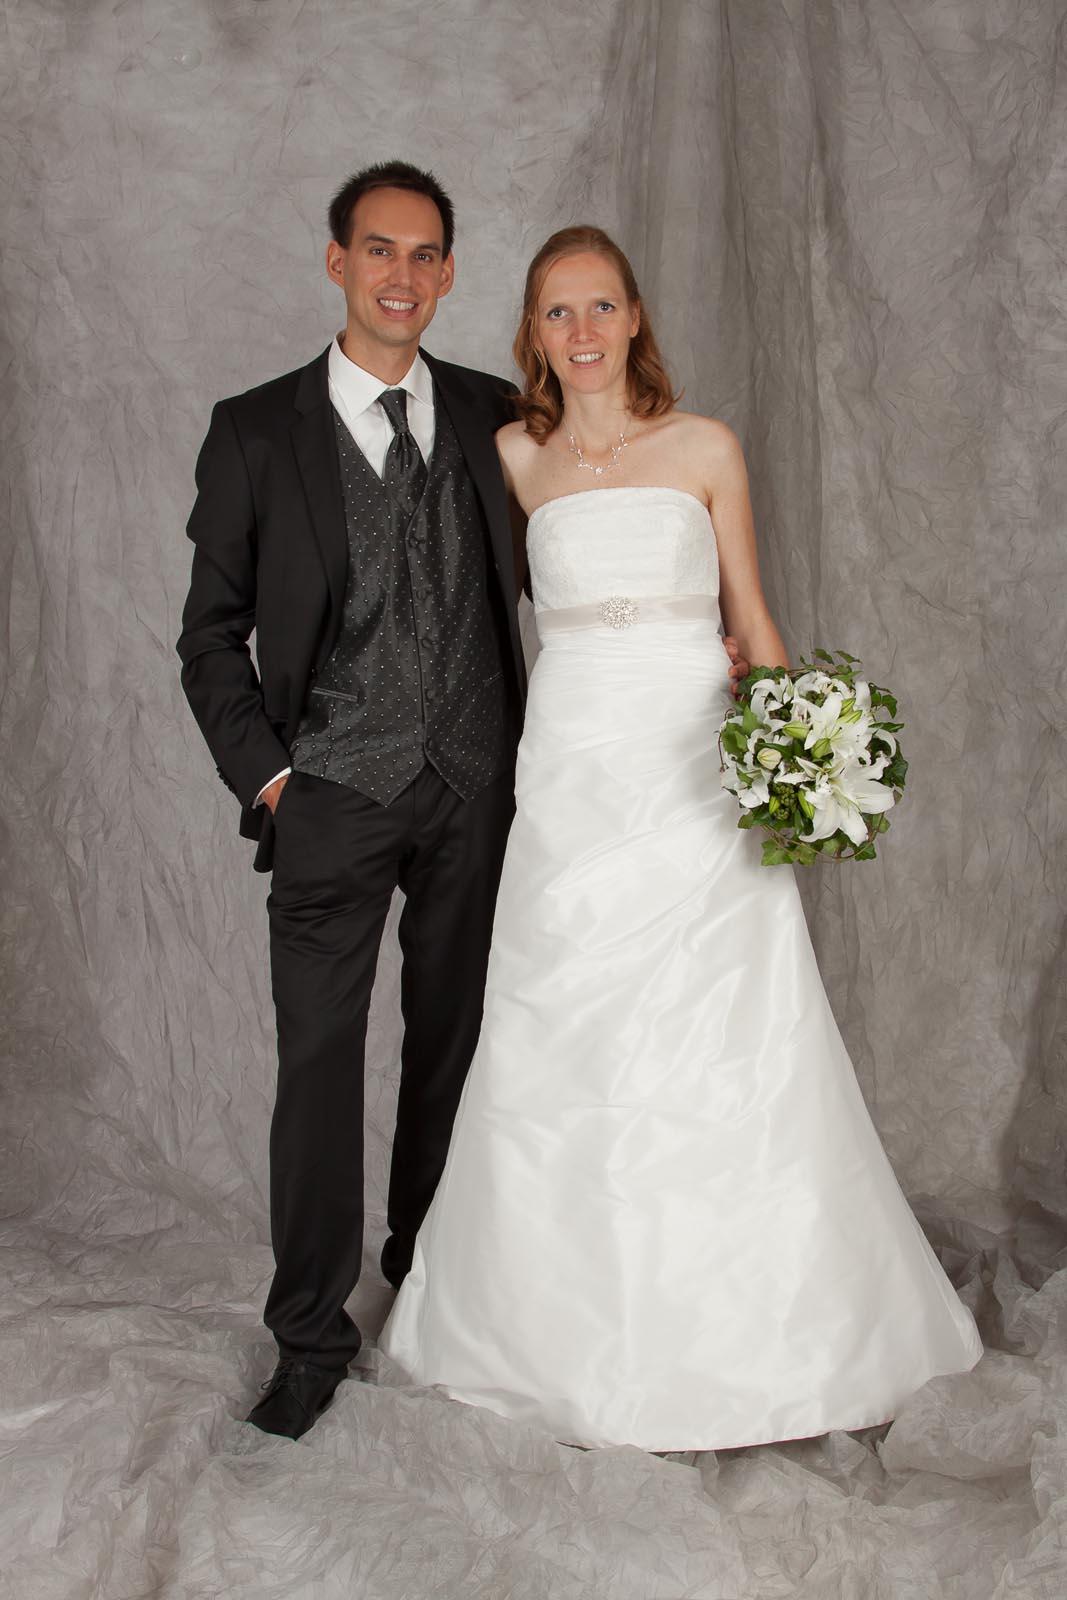 Hochzeitsportraits-Pohl-Pohler-Hochzeit-Pohl-Pohler-0391.jpg